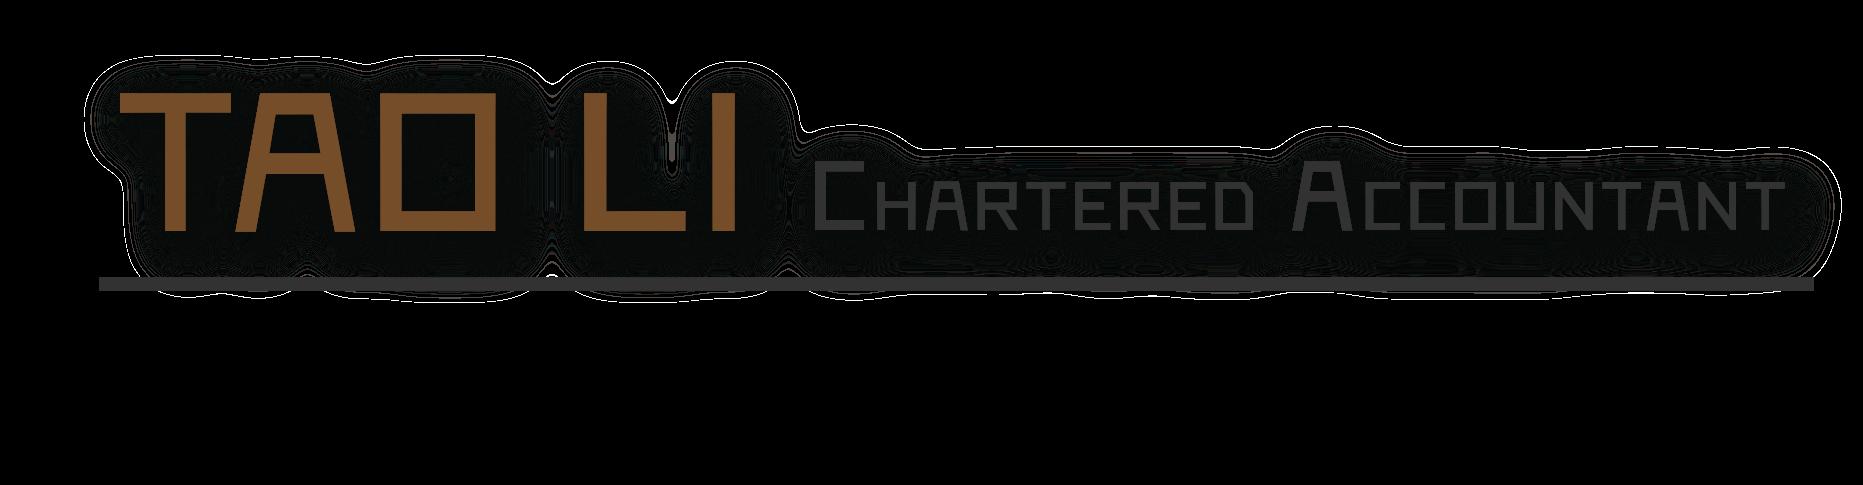 Tao Li Chartered Professional Accountant and Chartered Accountant